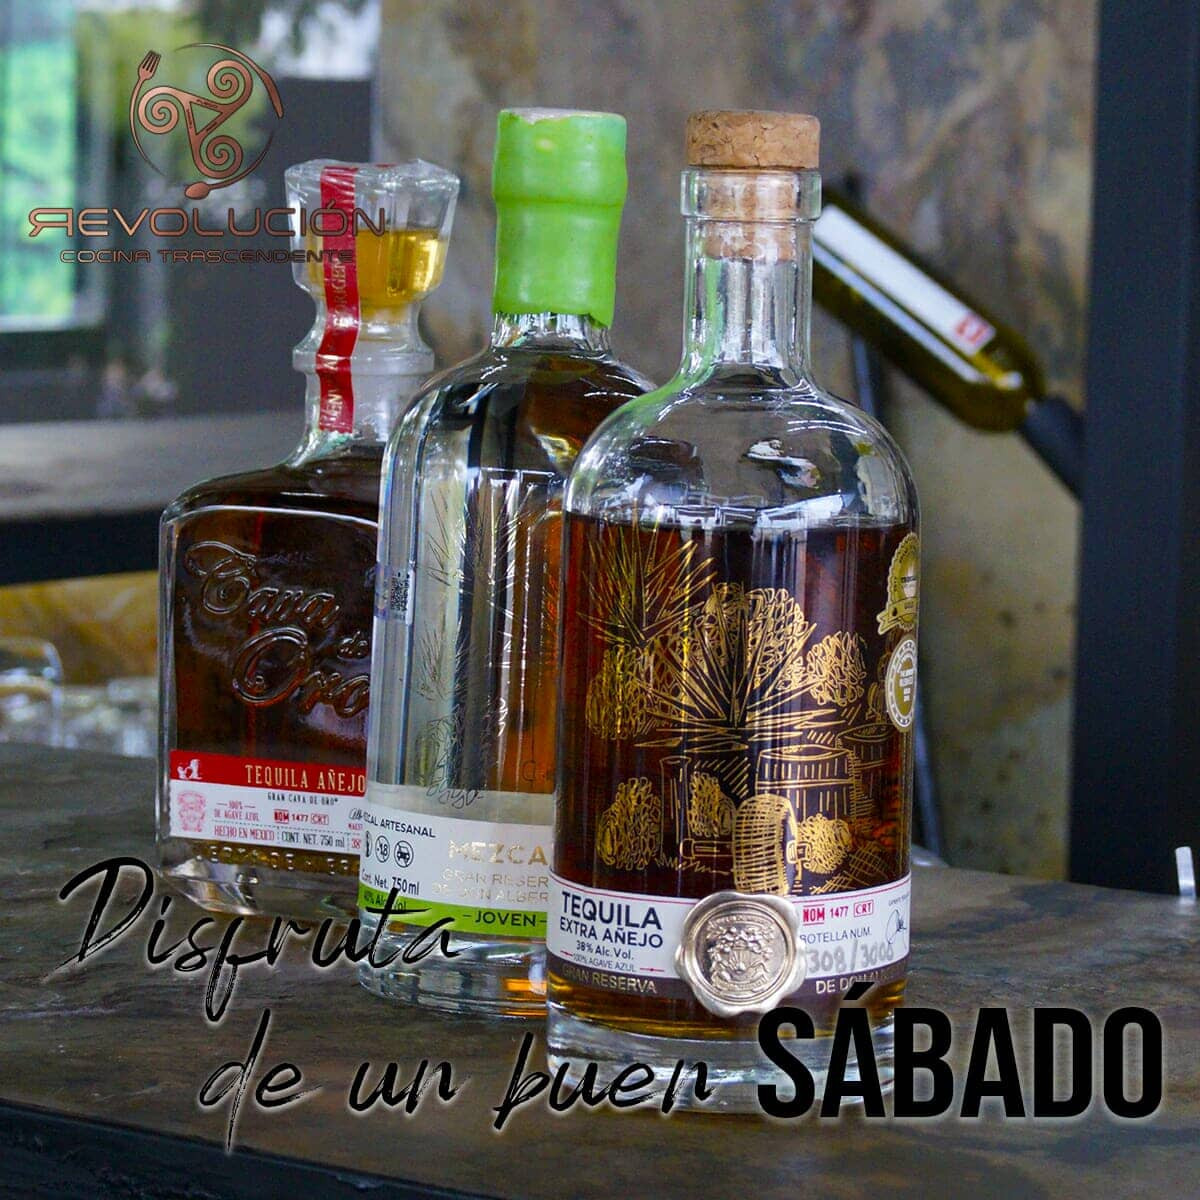 REVOLUCION COCINA TRASCENDENTE - Tequila & Mezcal